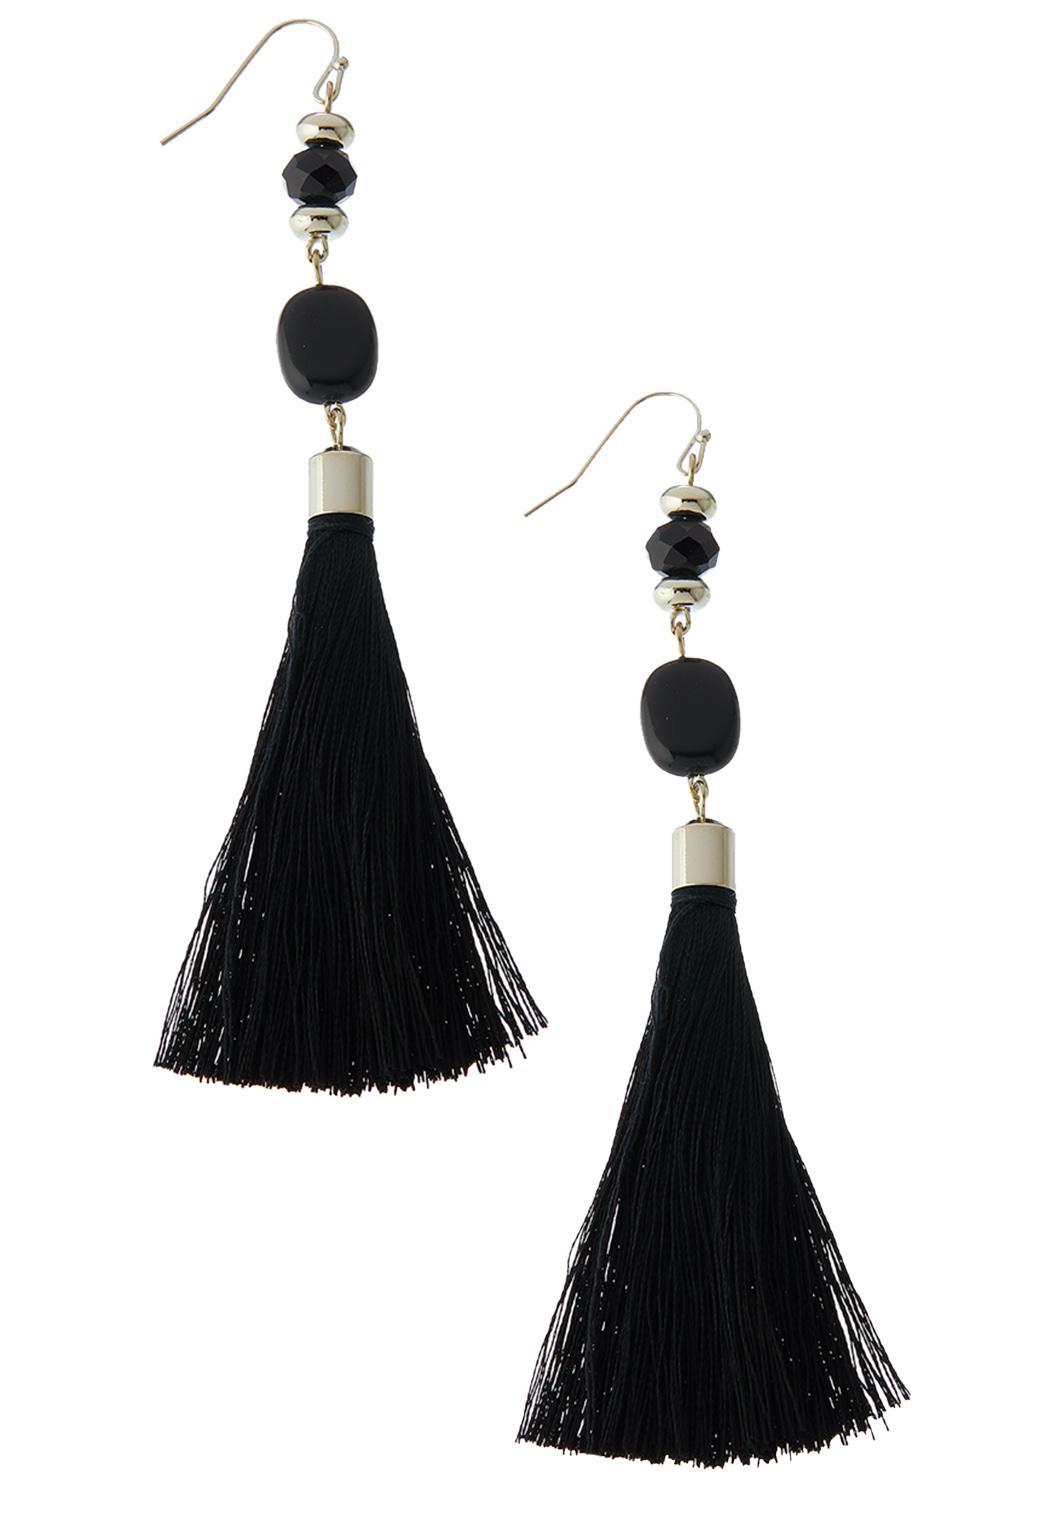 Bead Fabric Tassel Earrings